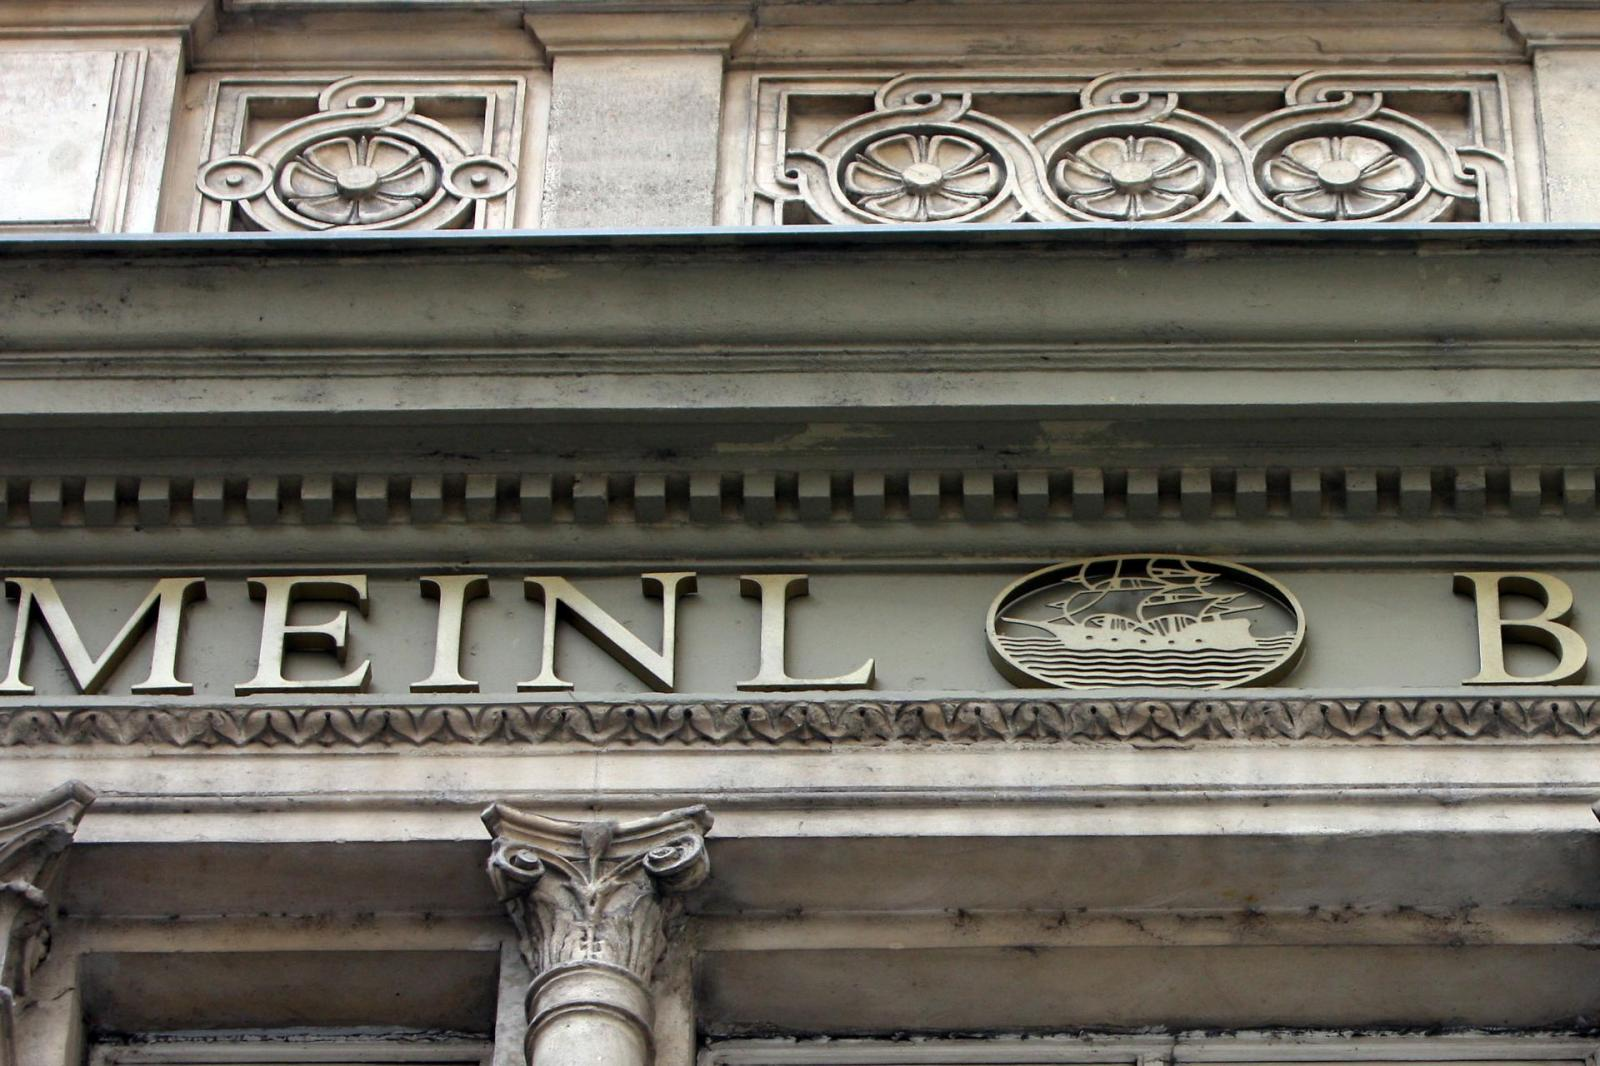 finance banks crime corruption money laundering asset stripping fraud embezzlement Austria